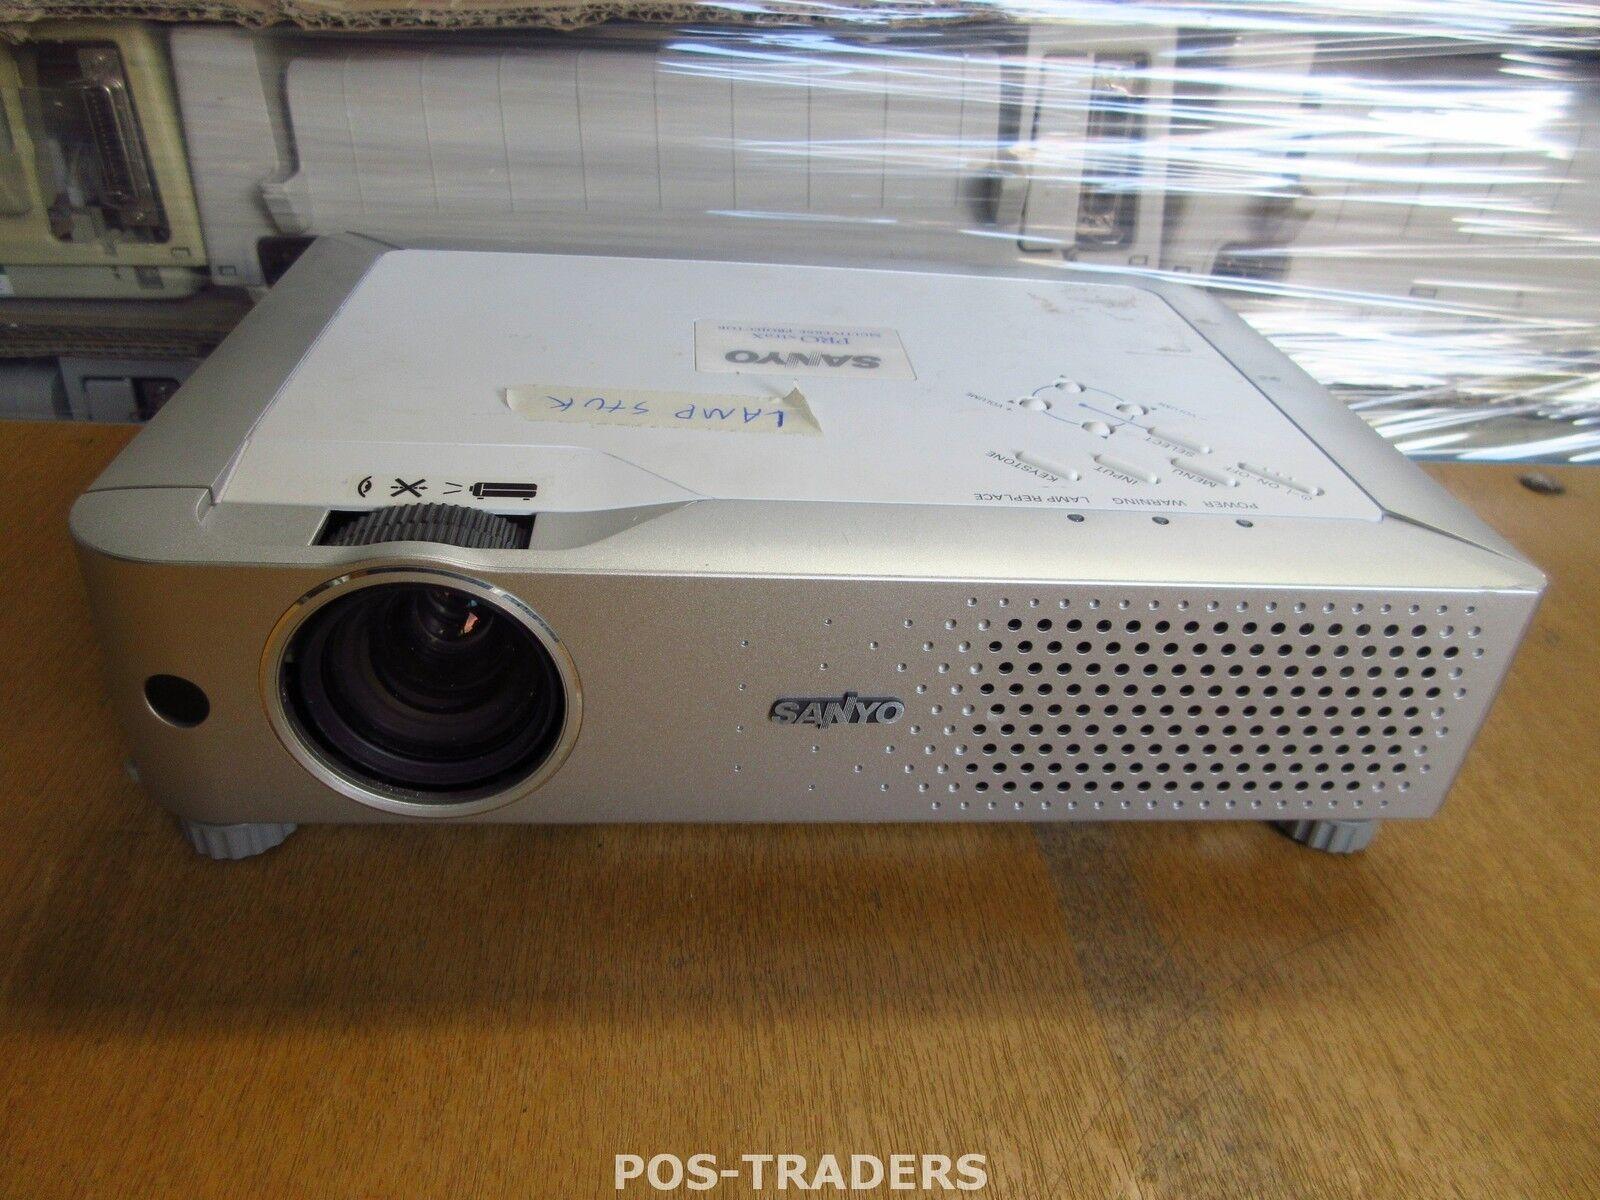 Sanyo PLC-XU74 Projector Beamer Beamer Beamer 2500 LUMENS XGA Excl Remote LAMP DEFECT 003155